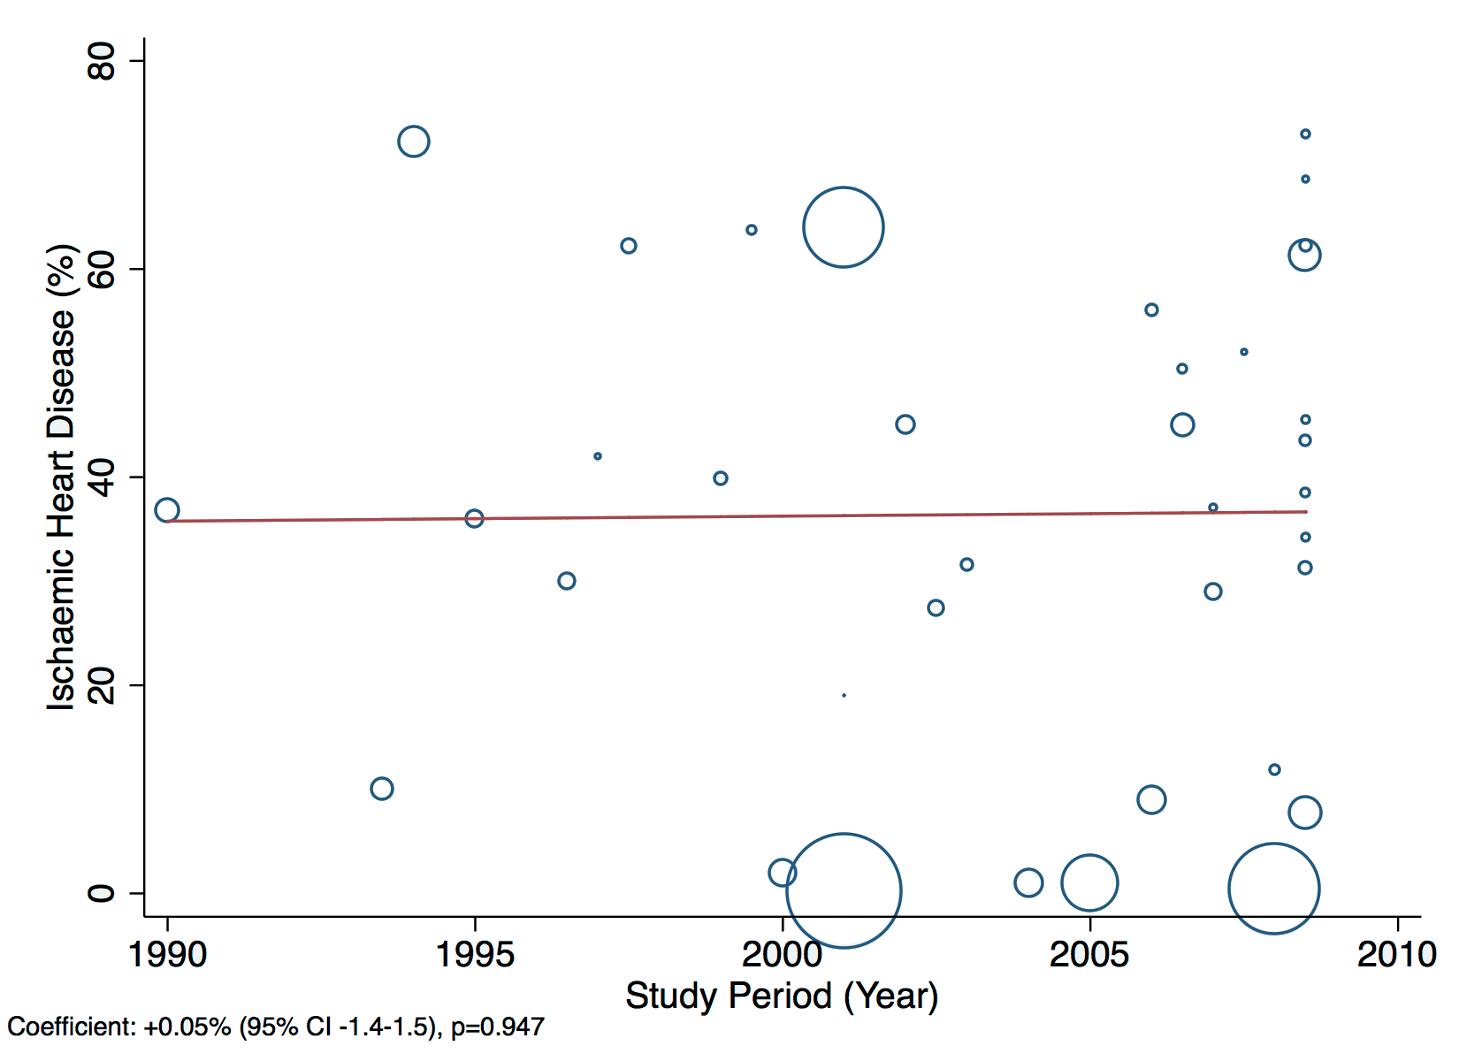 Meta-regression of ischaemic heart disease against study period.